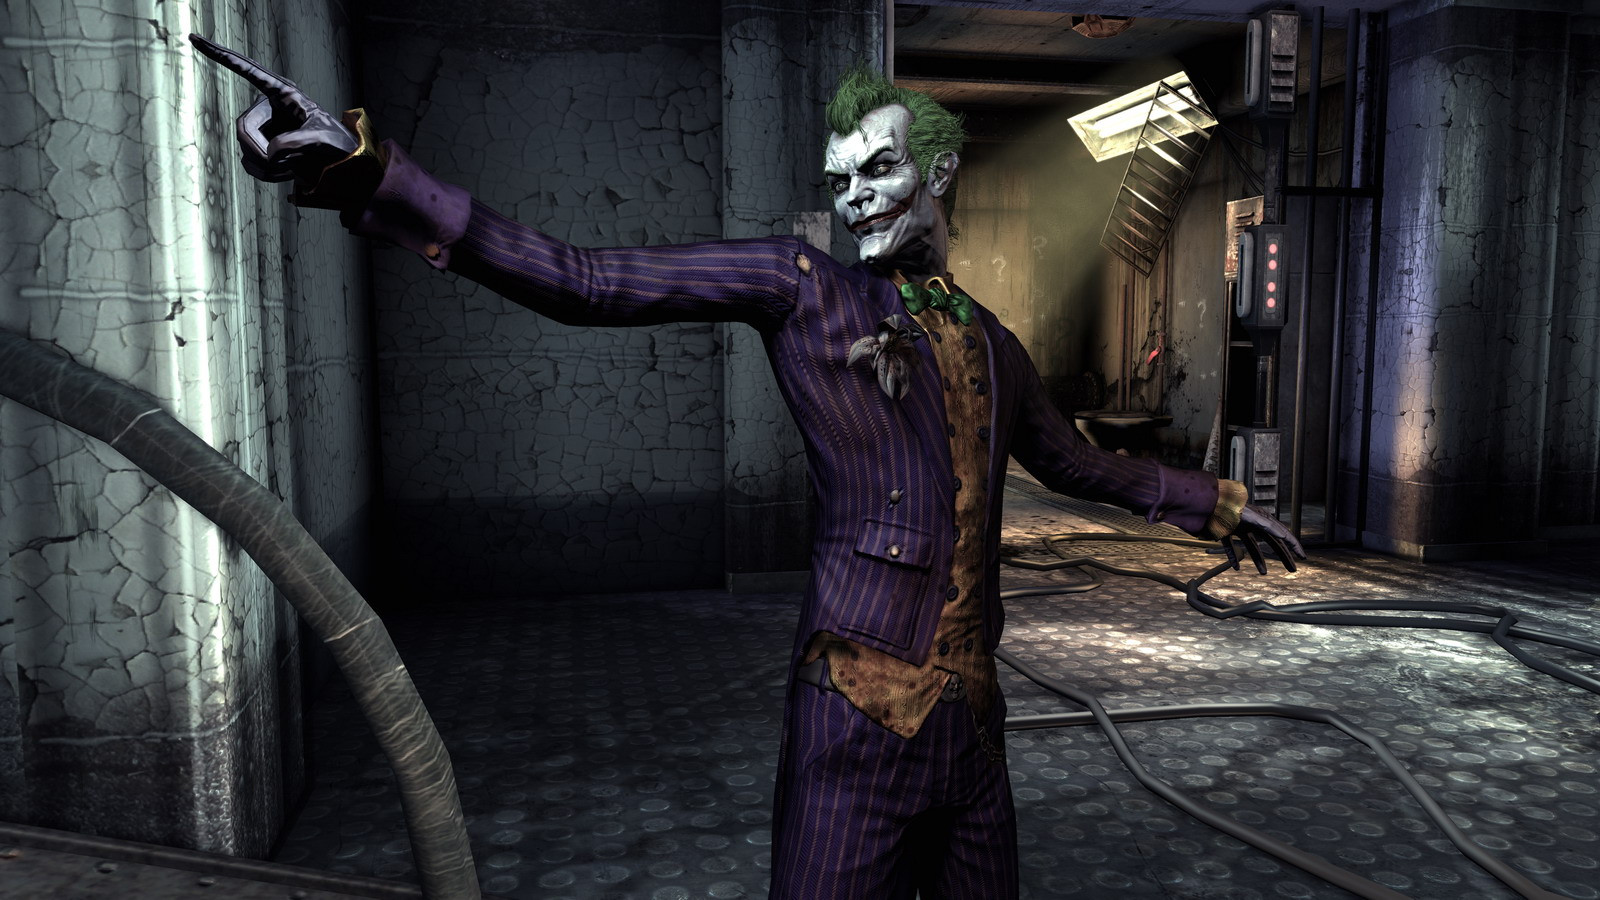 File:Joker-escapes.jpg